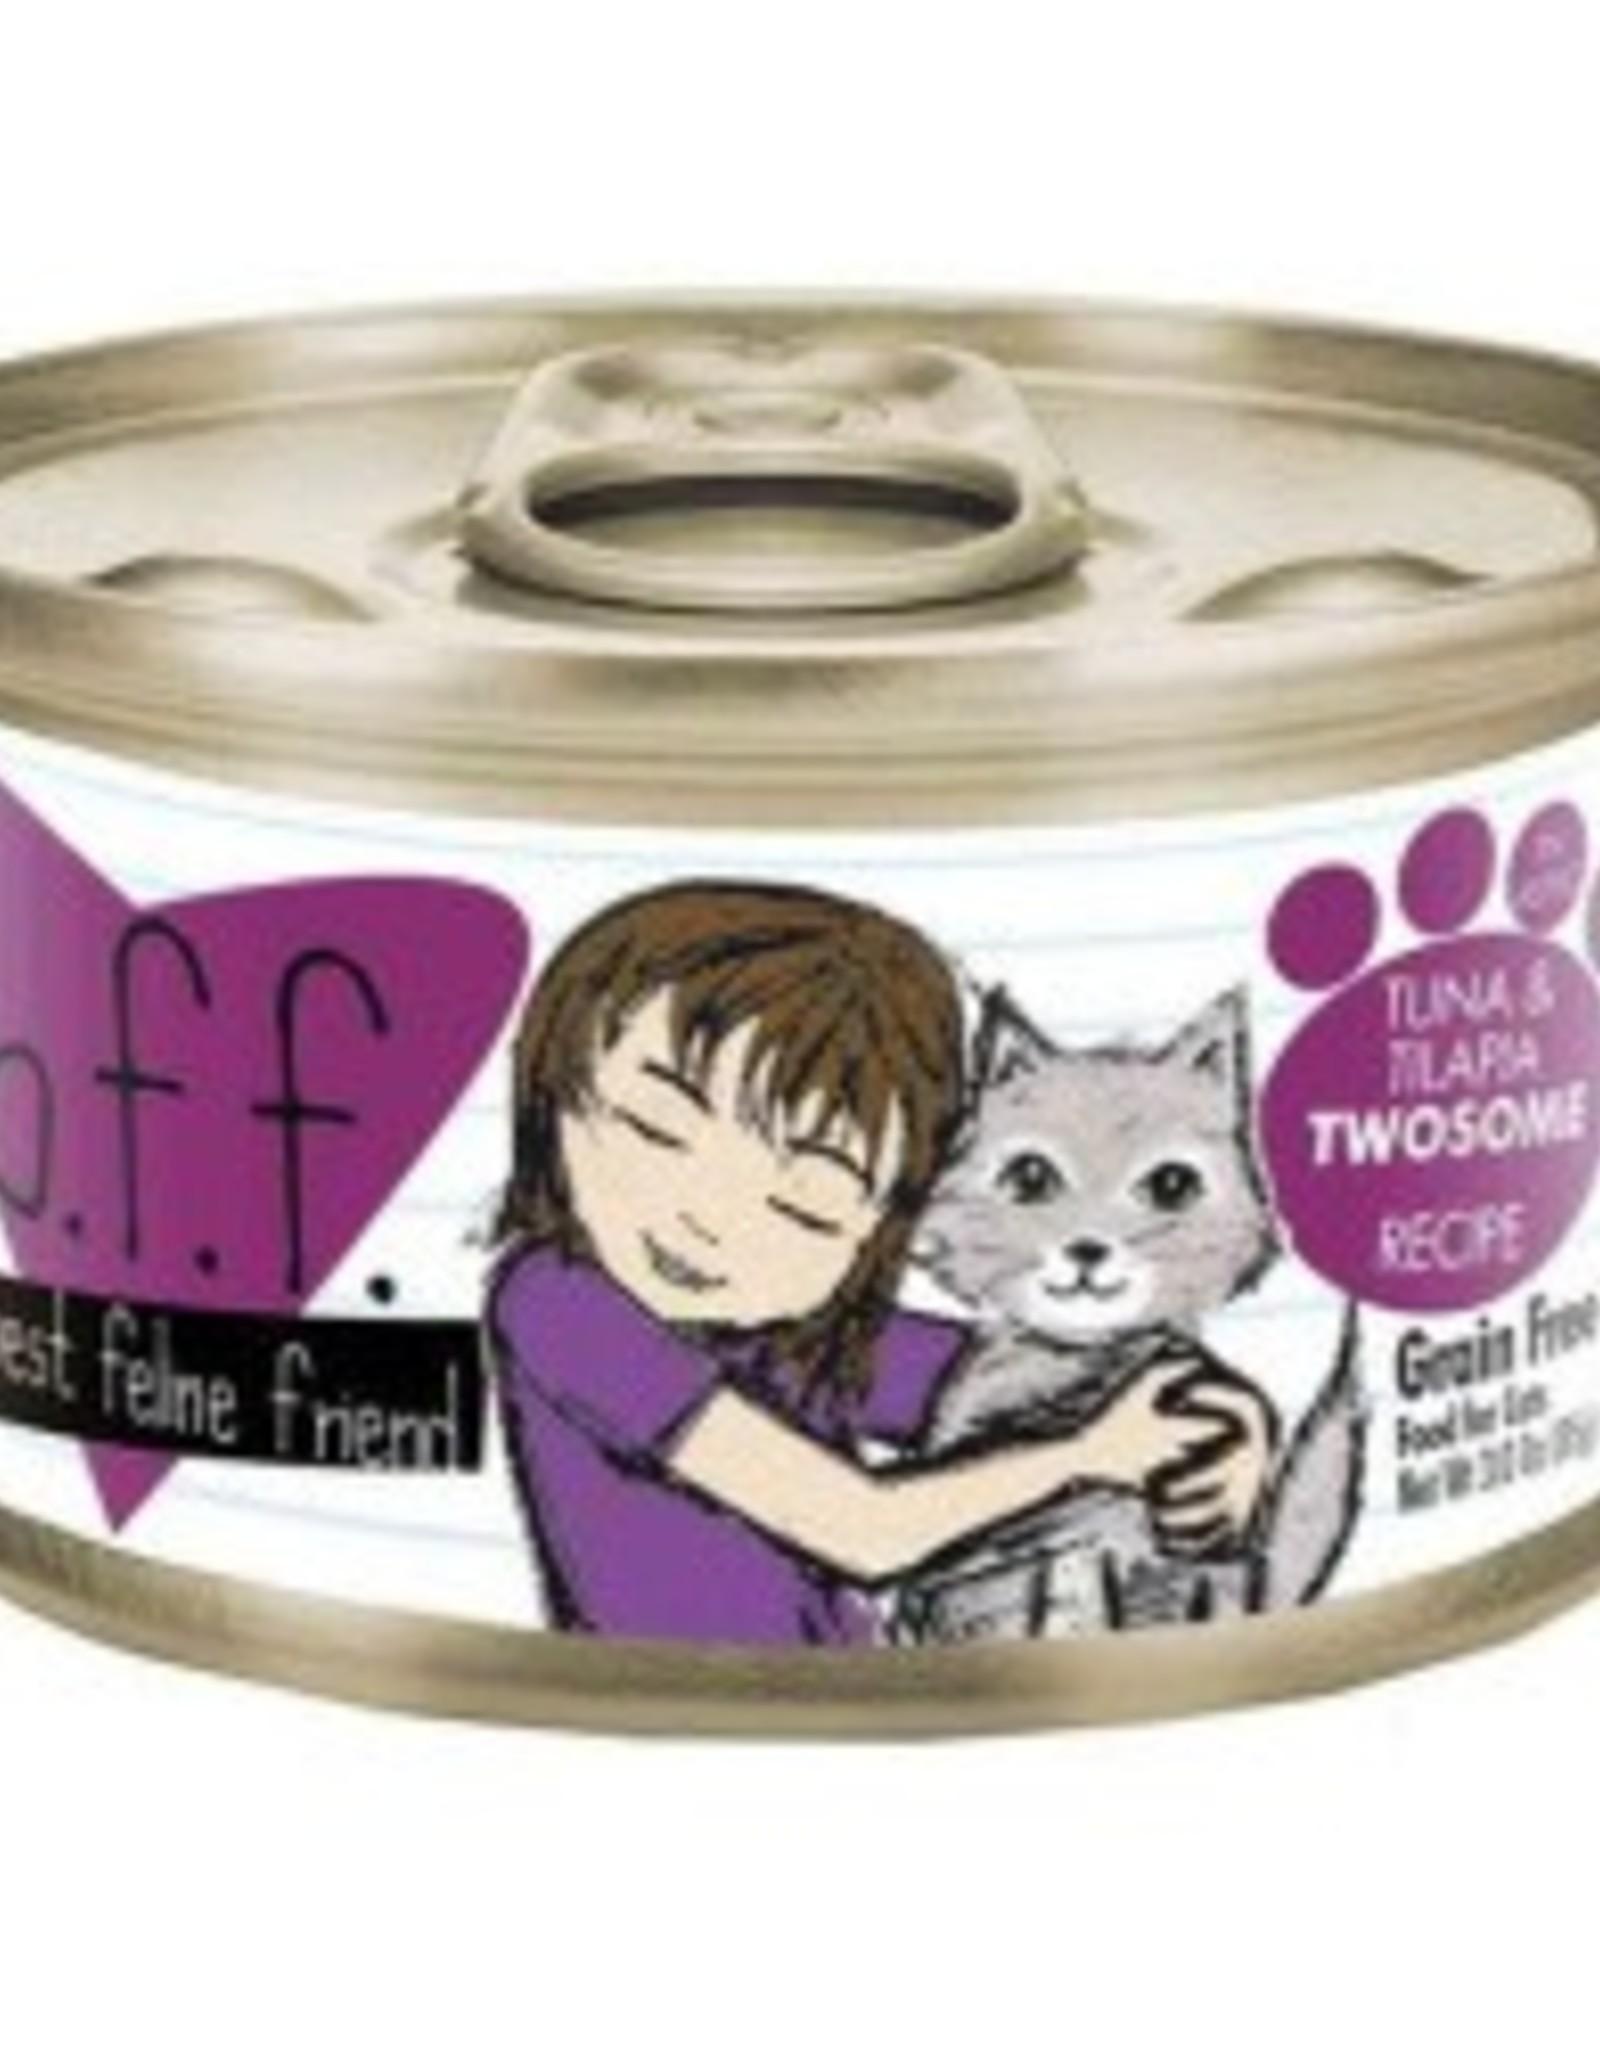 Weruva Weruva BFF Cat Food, Tuna & Tilapia Twosome Recipe 3 oz.